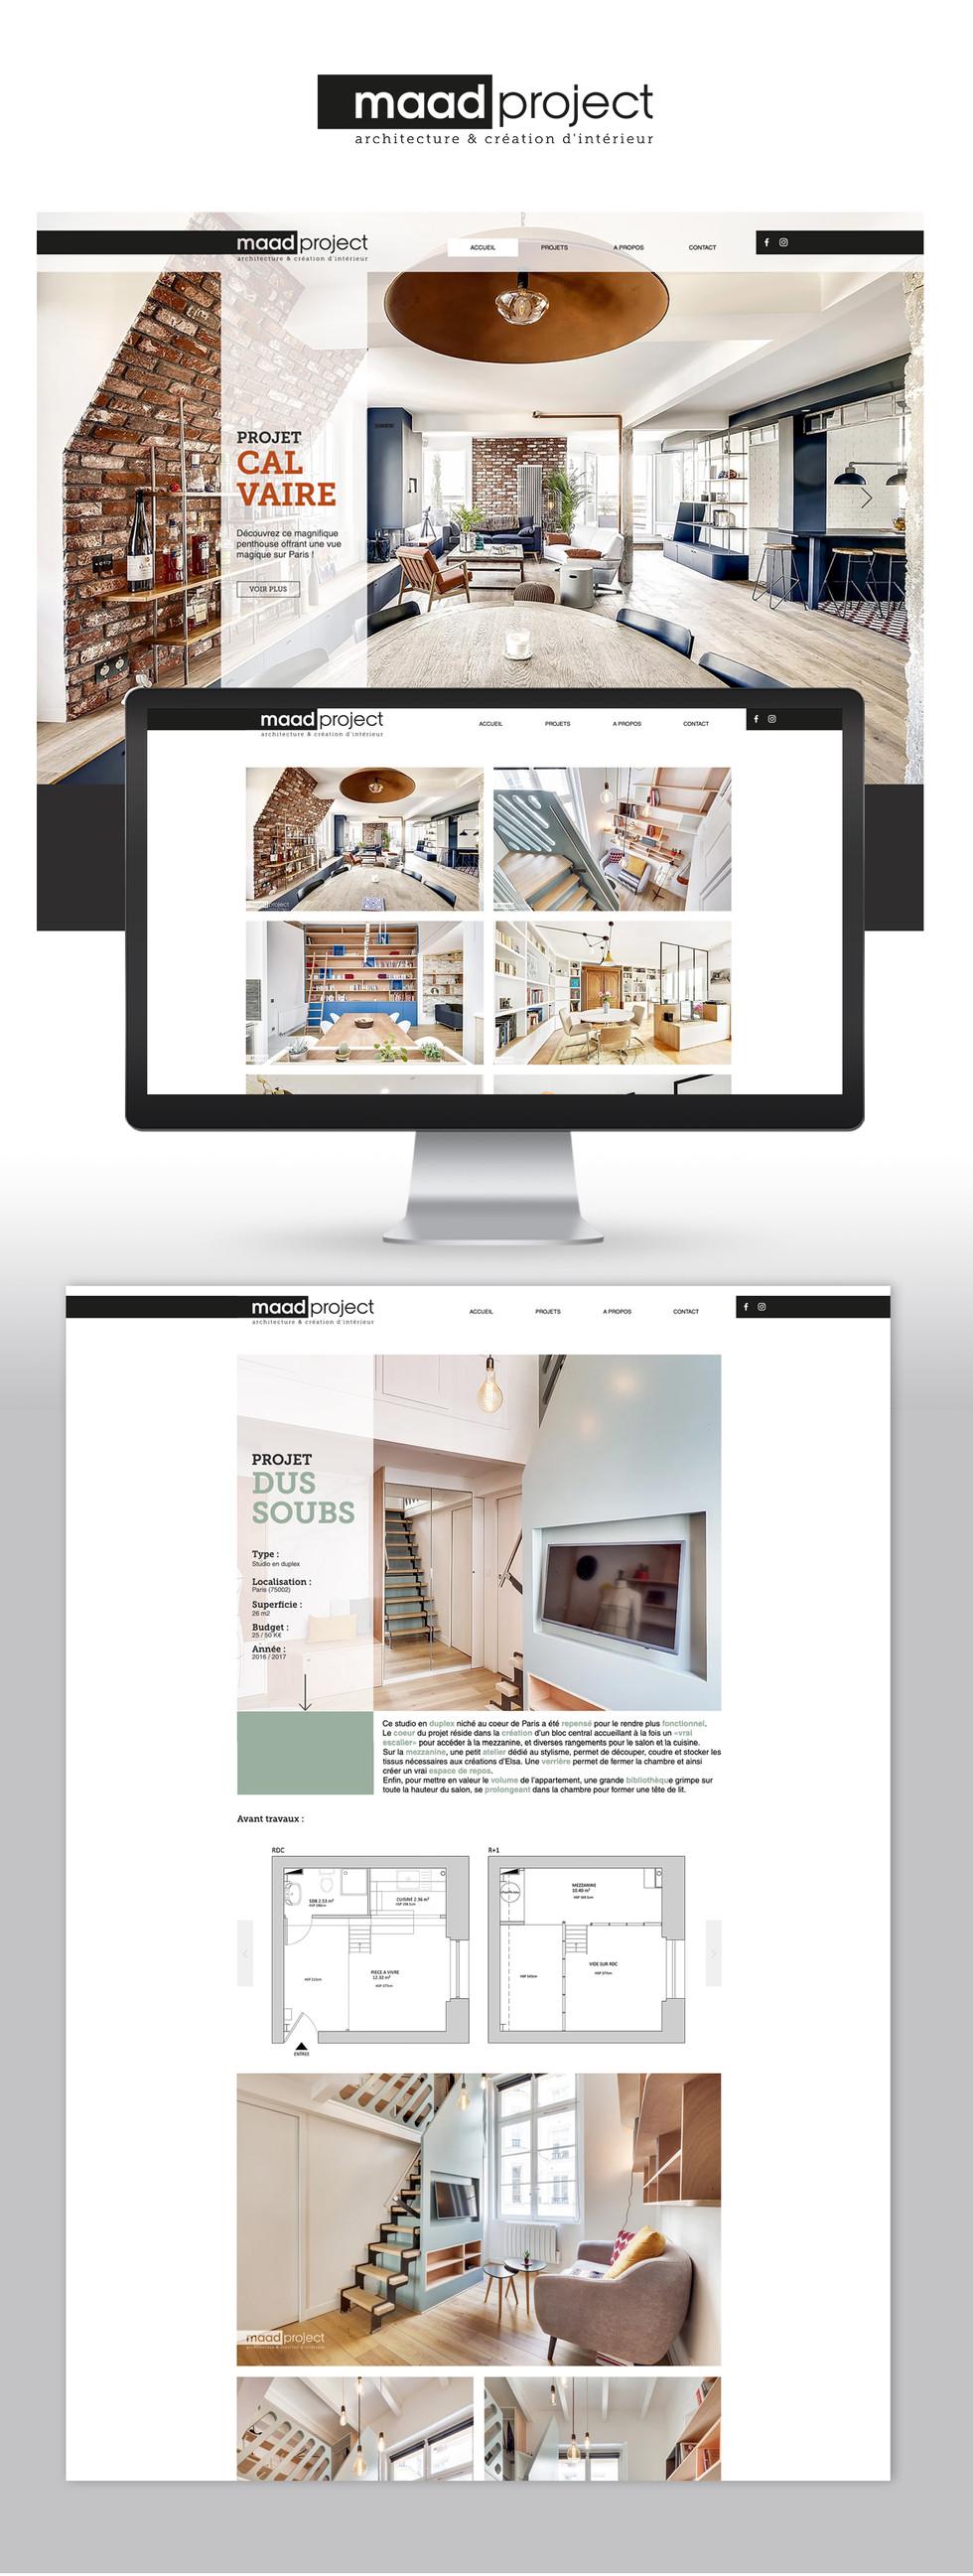 maadproject-webdesign.jpg